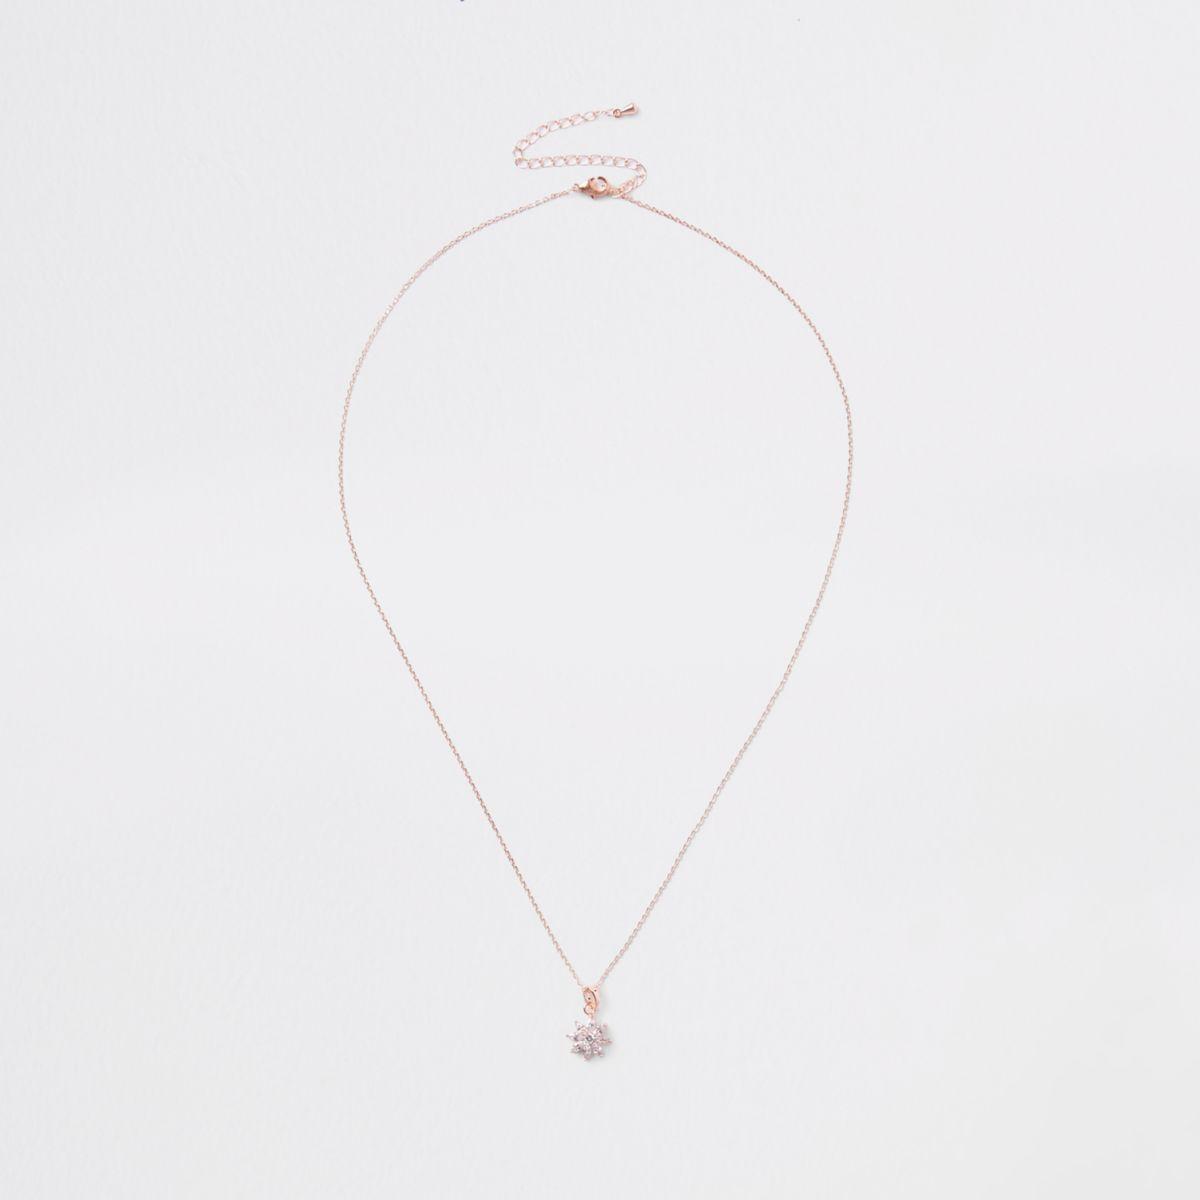 Rose gold floral diamante necklace